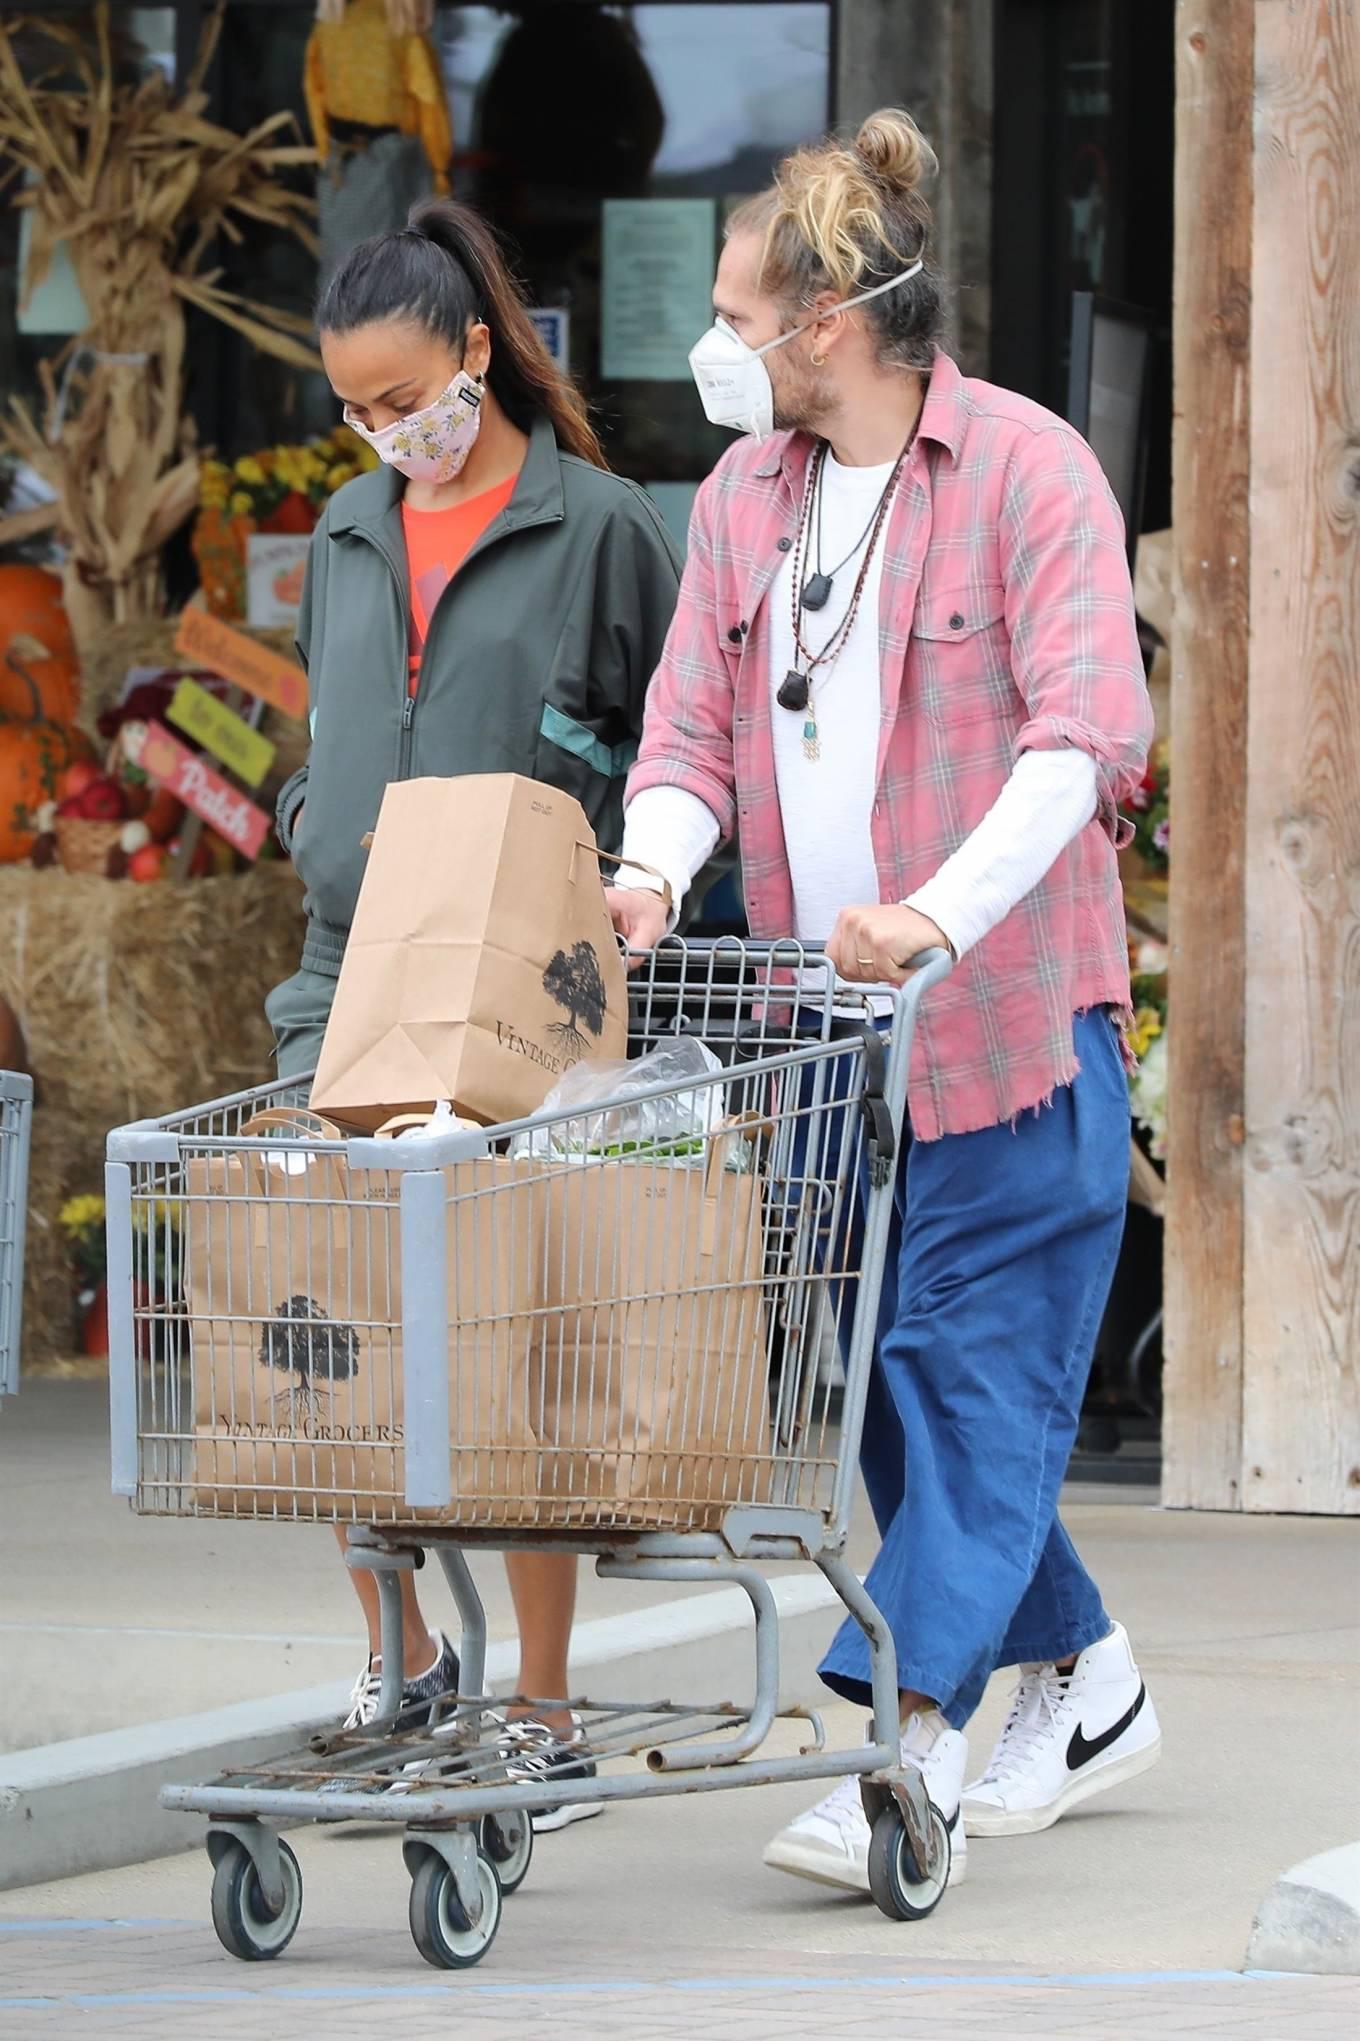 Zoe Saldana 2020 : Zoe Saldana with her her husband Marco Perego in Malibu-02